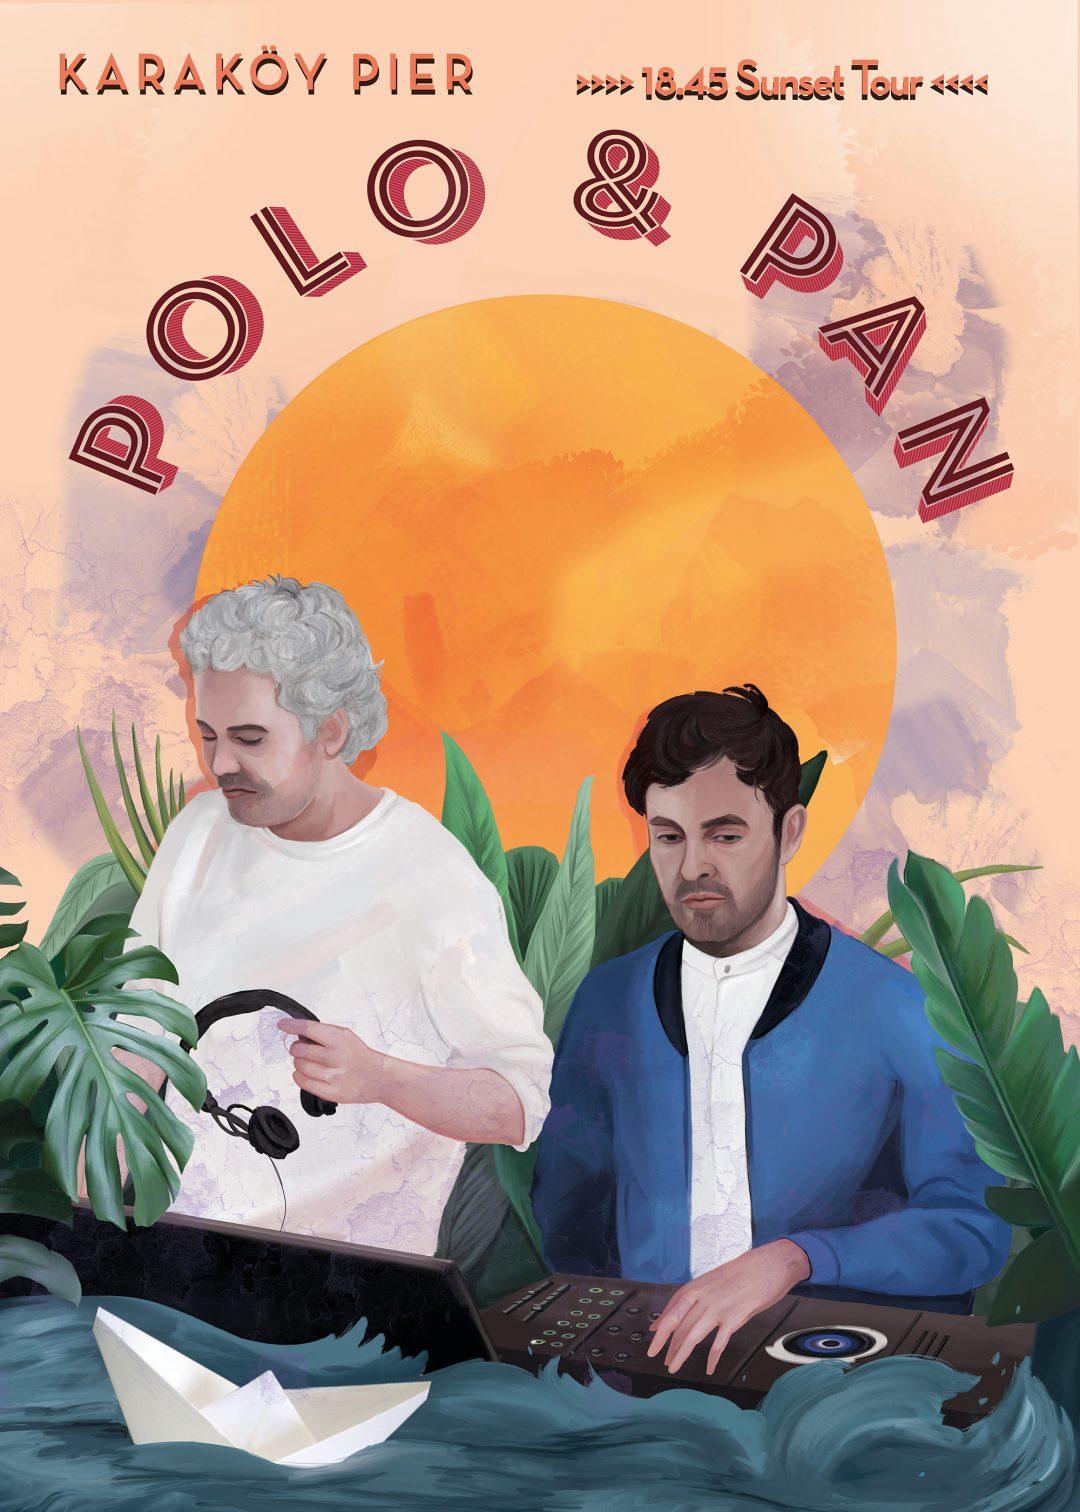 Dream Gigs Illustrated: Ece Haskan - Polo & Pan @ 8:45 Karaköy Vapuru